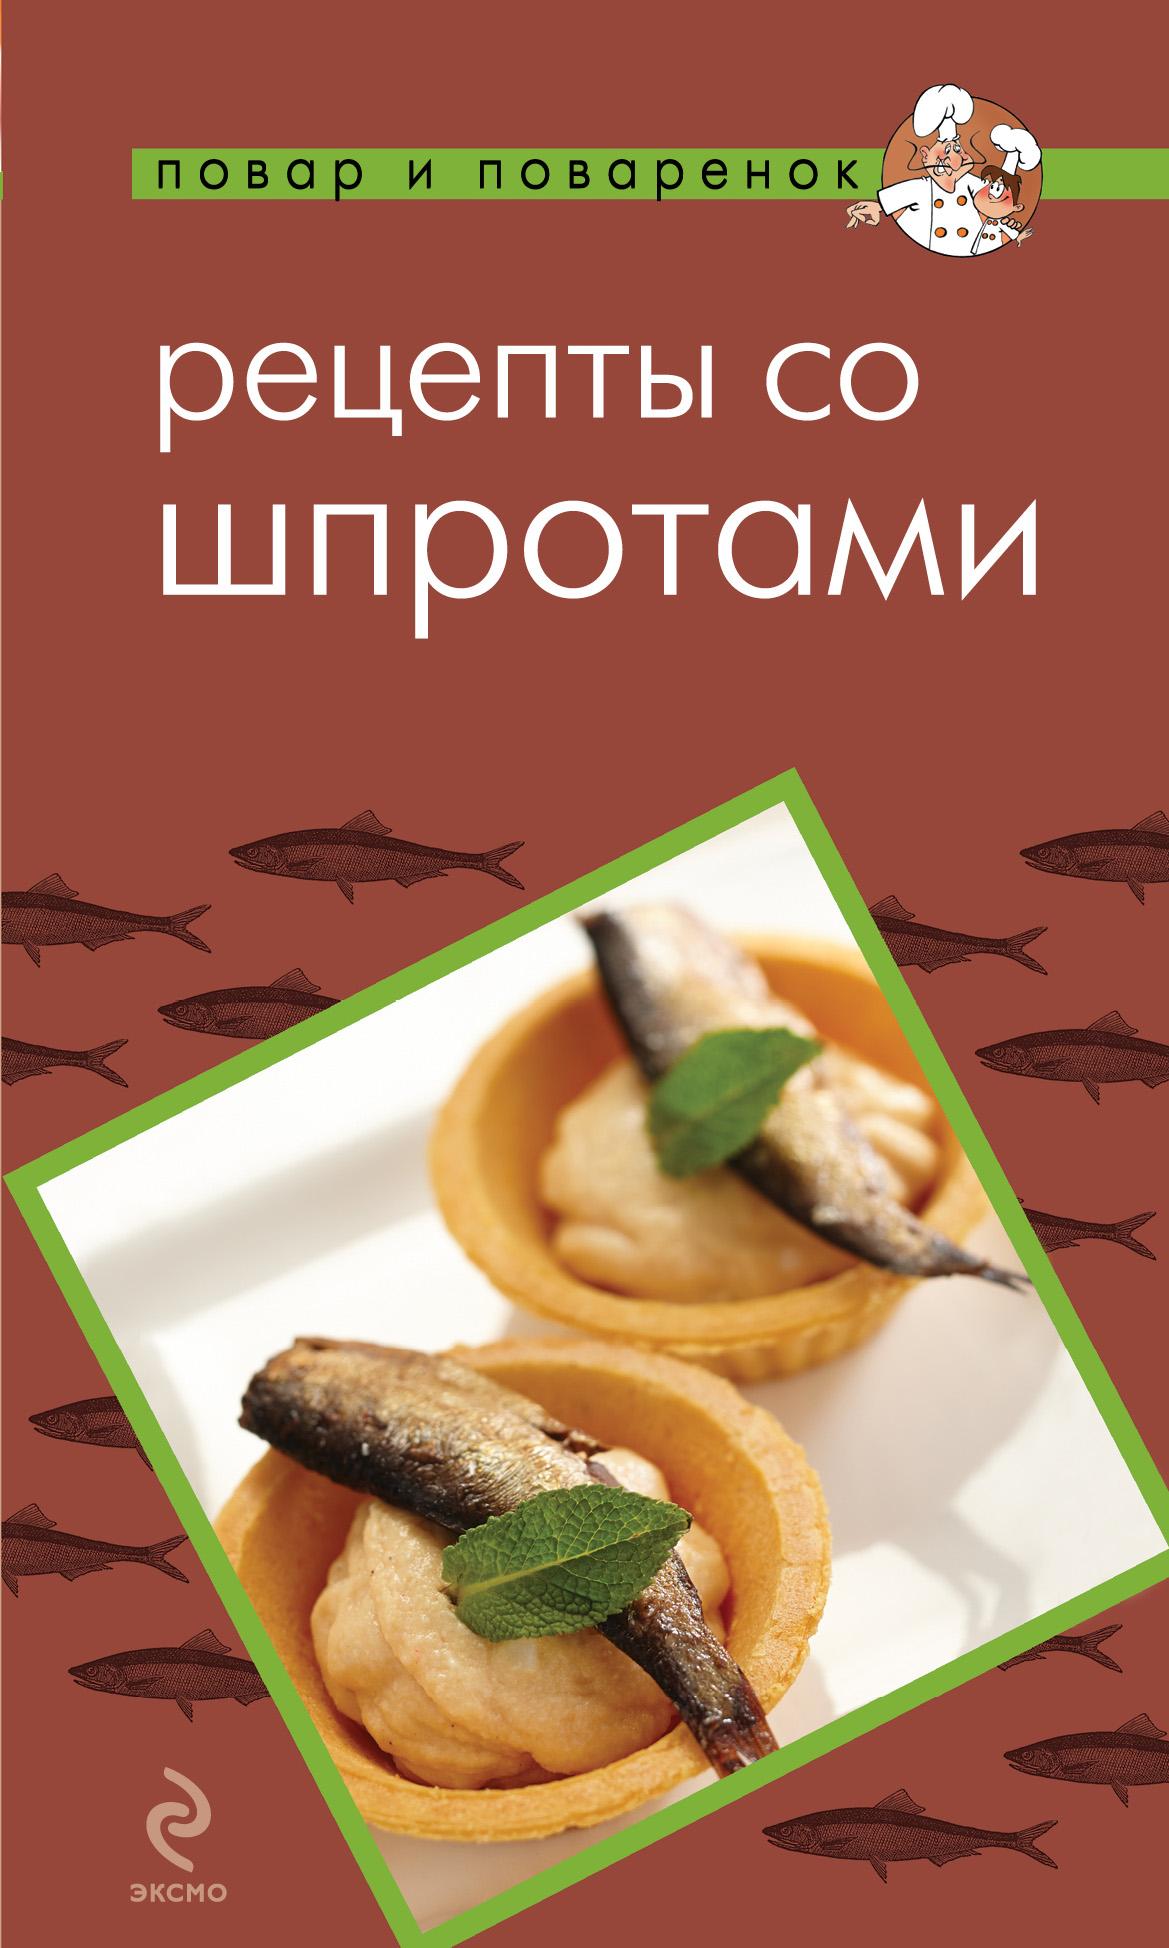 Рецепты со шпротами